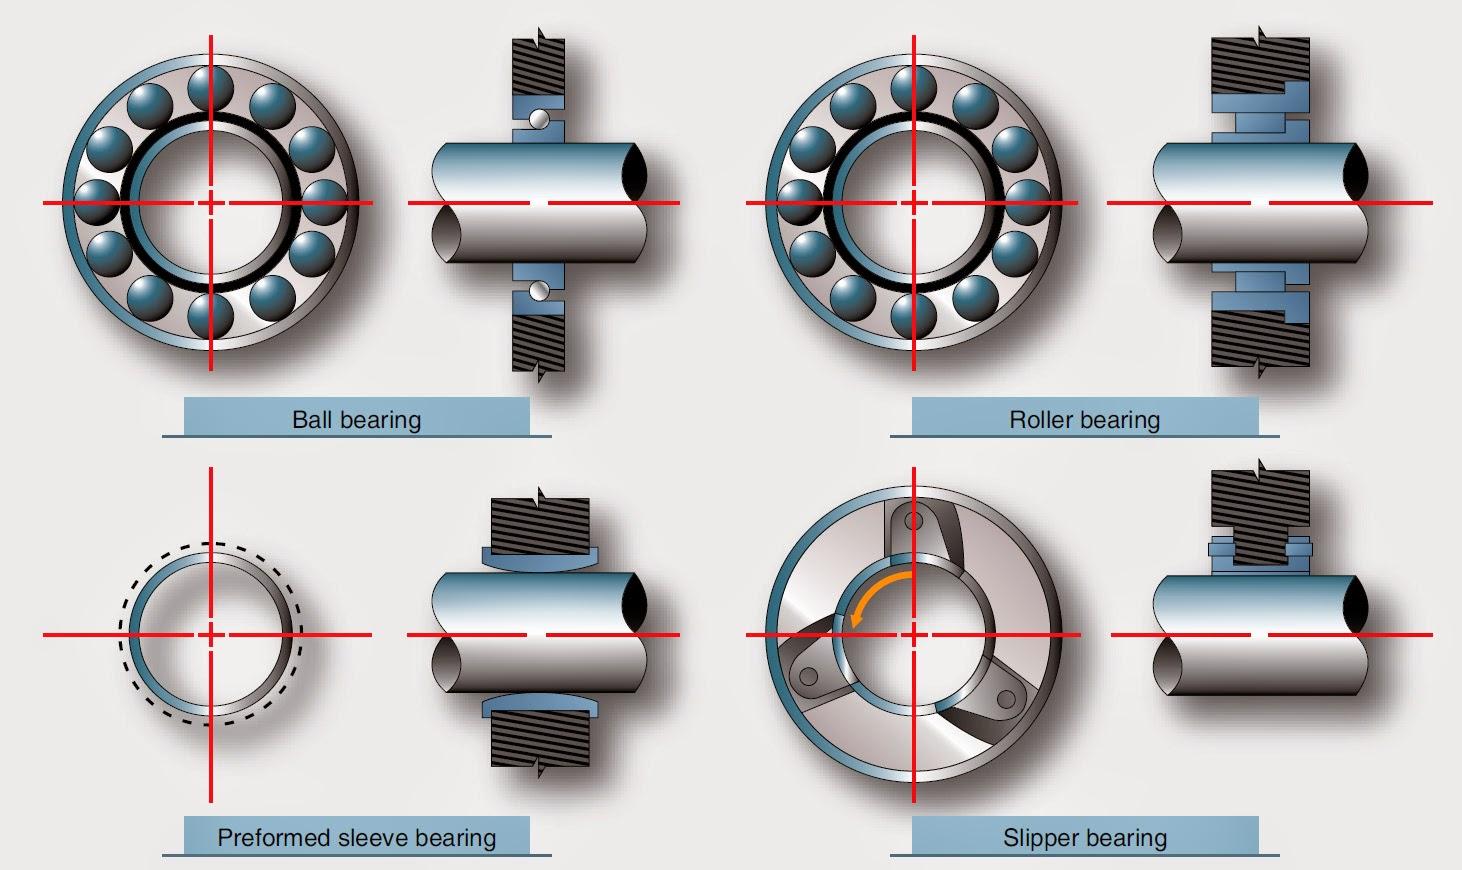 Aeronautical Guide Gas Turbine Engine Bearings And Seals